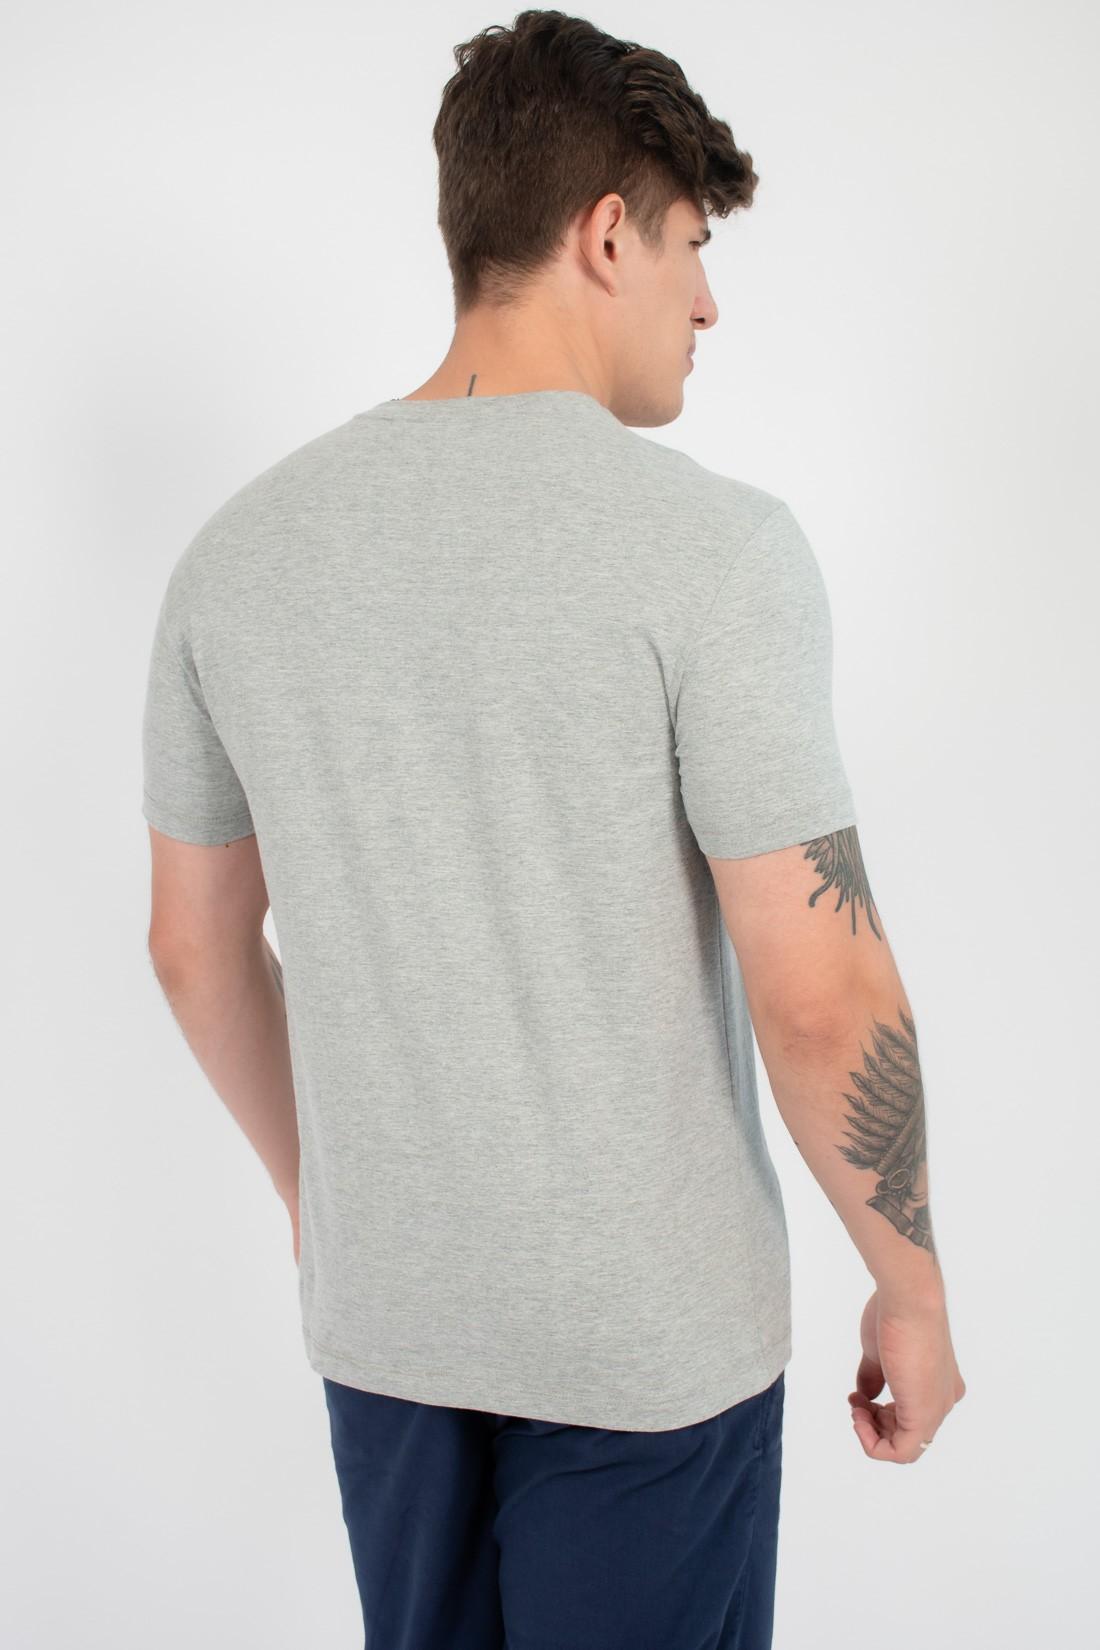 Camiseta Mc Calvin Klein Institucional Faixa